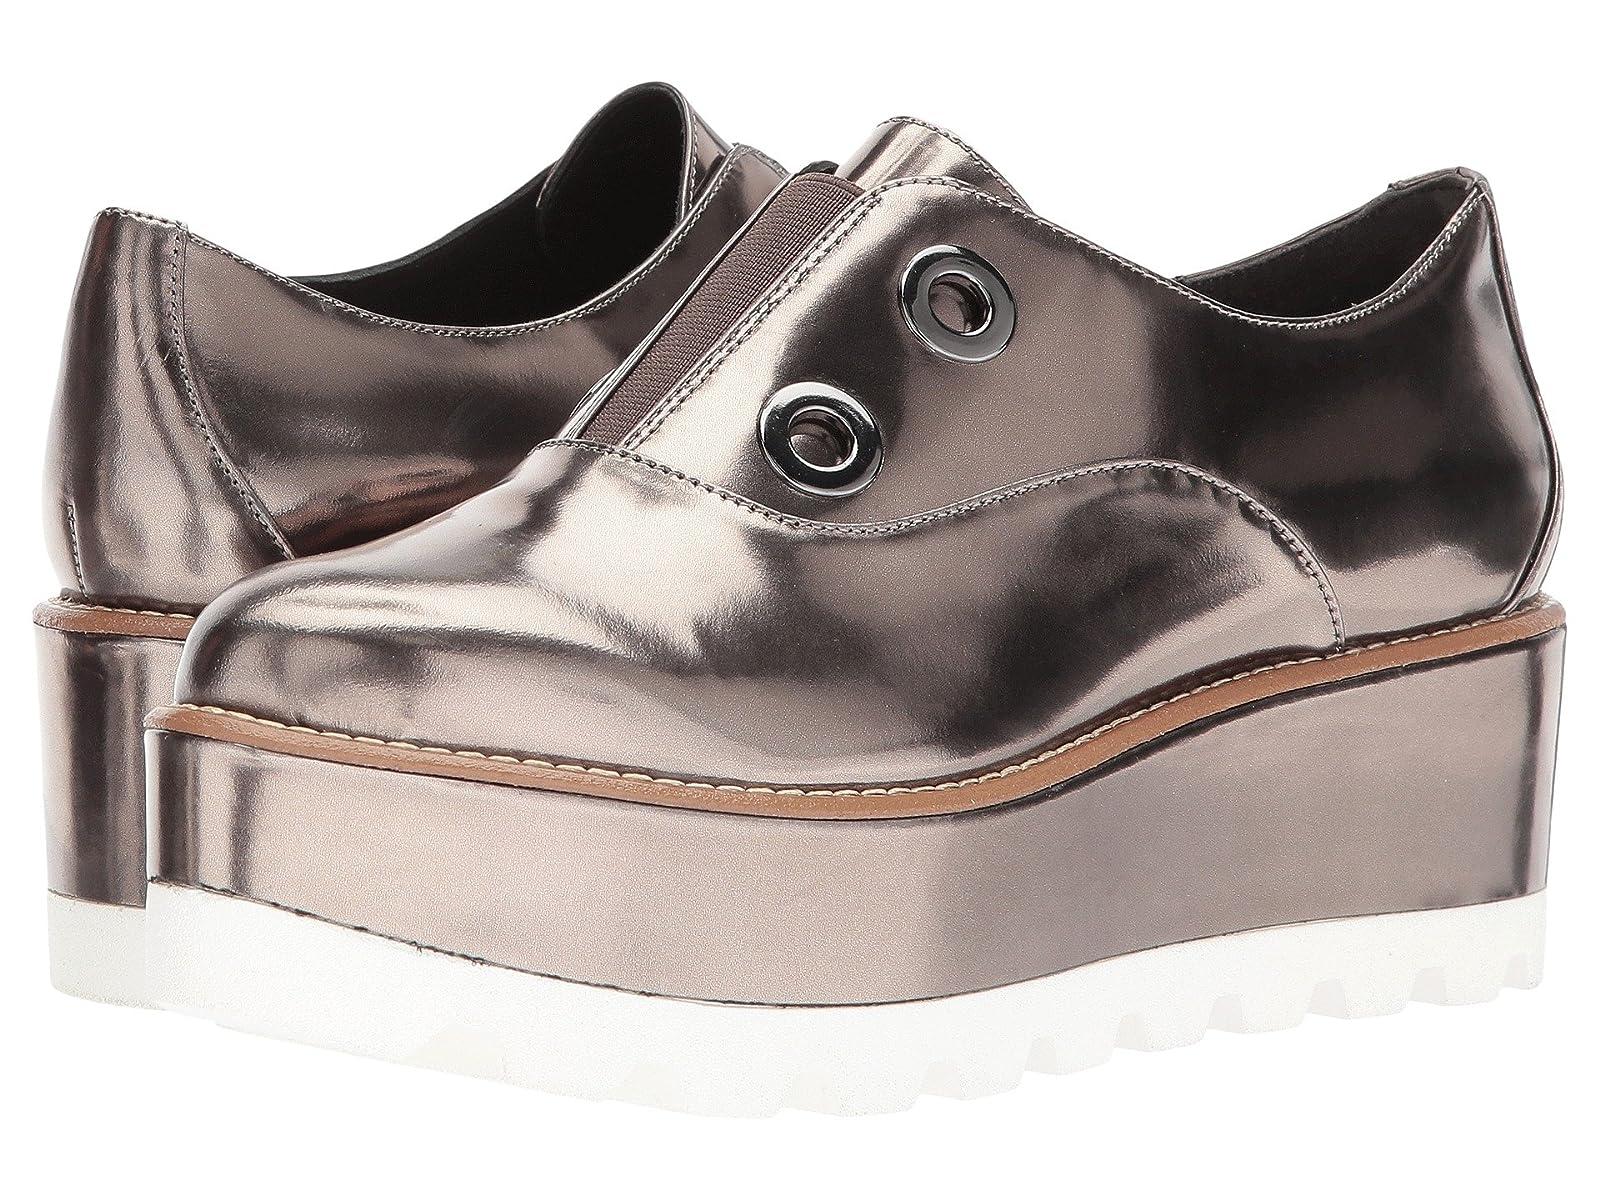 Donna Karan Uri Platform OxfordCheap and distinctive eye-catching shoes